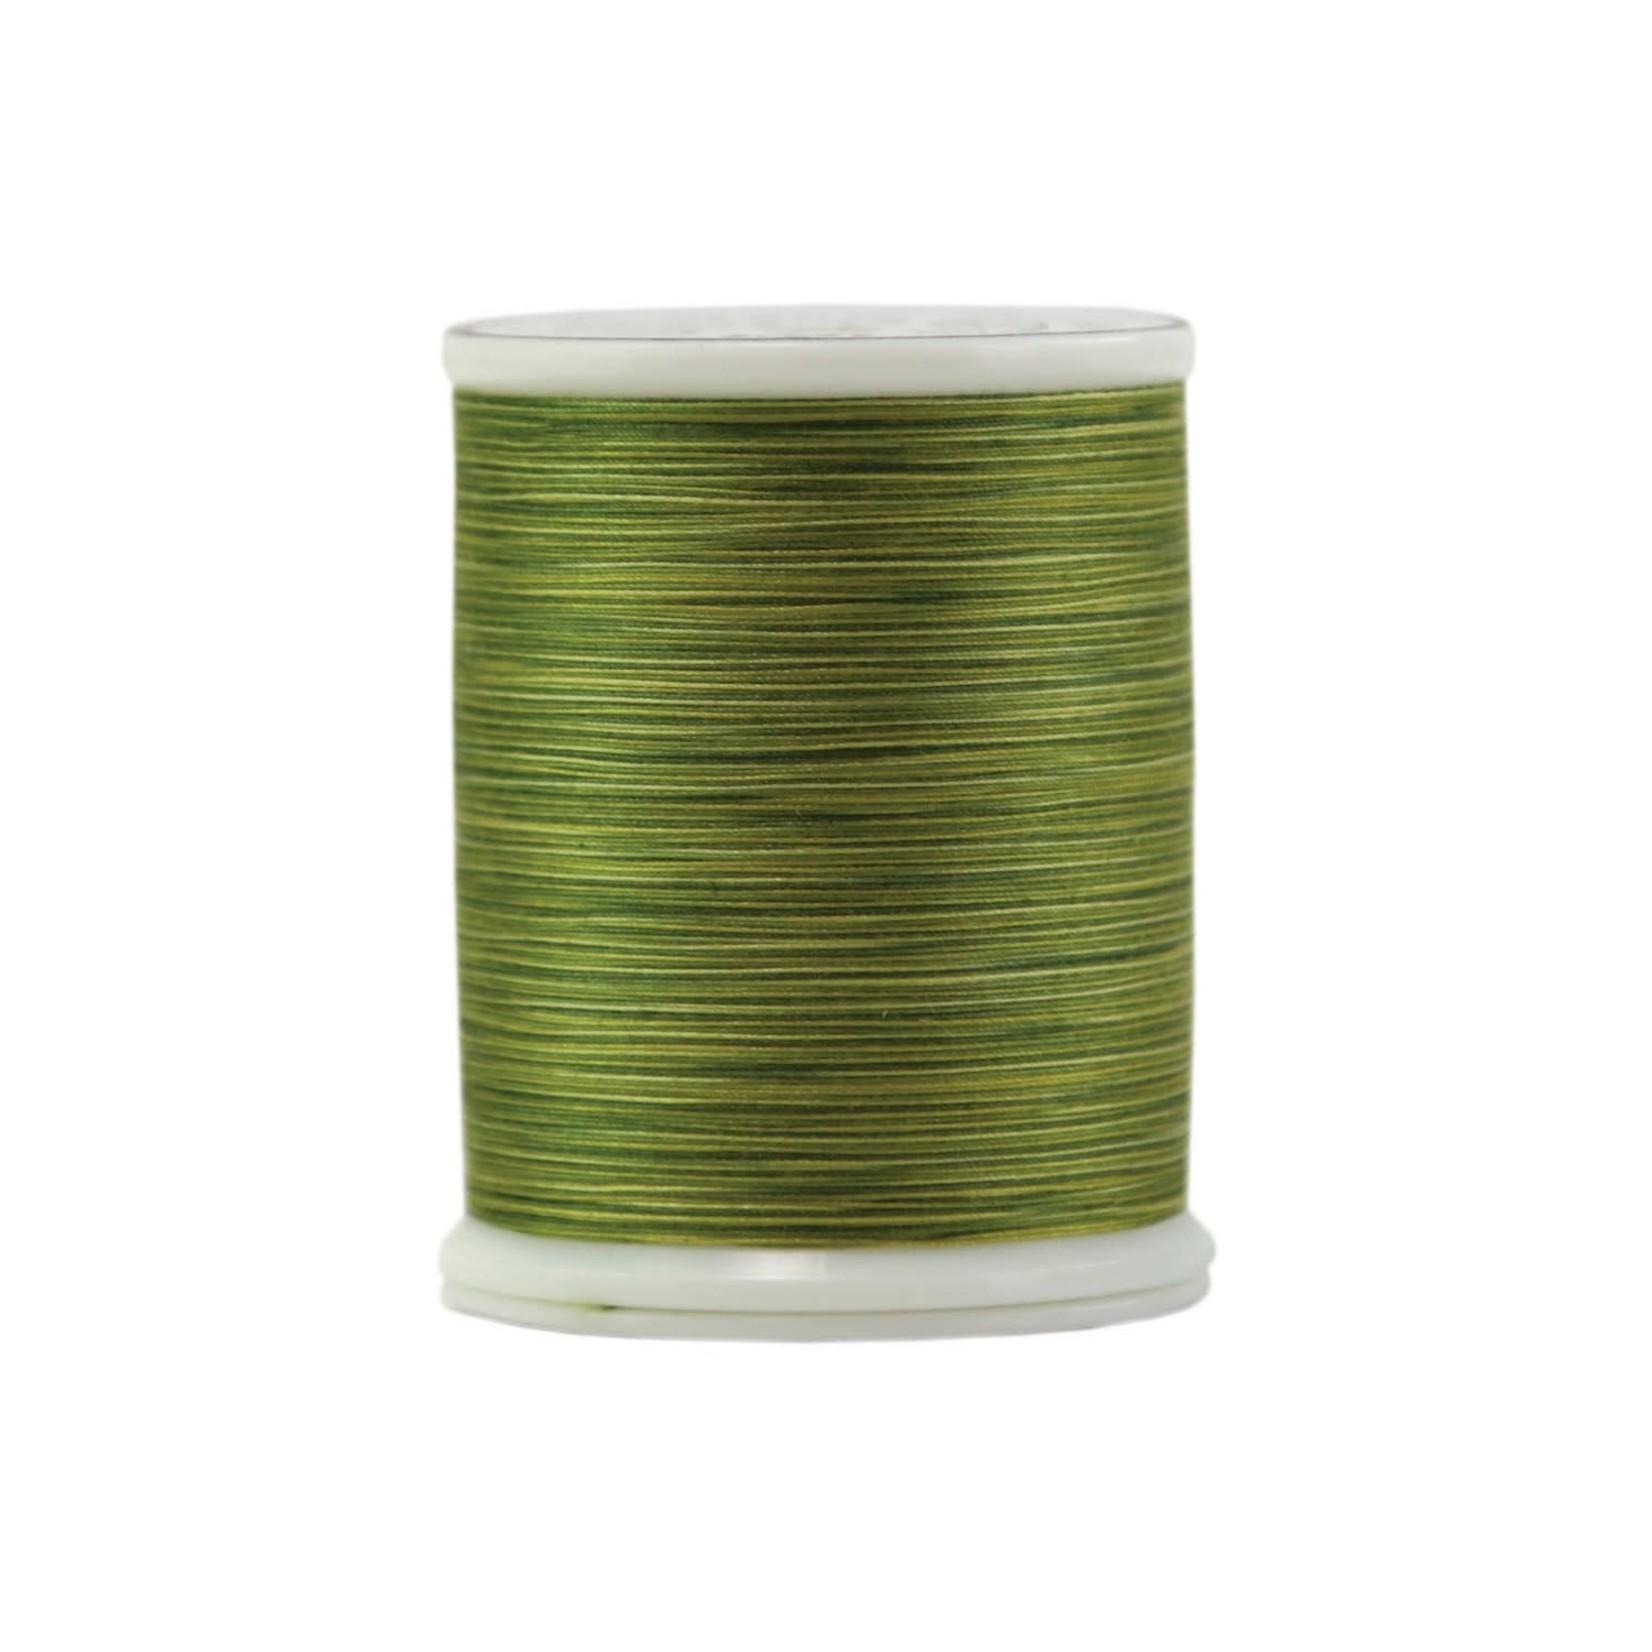 Superior Threads King Tut - #40 - 457 m - 1041 Highlands